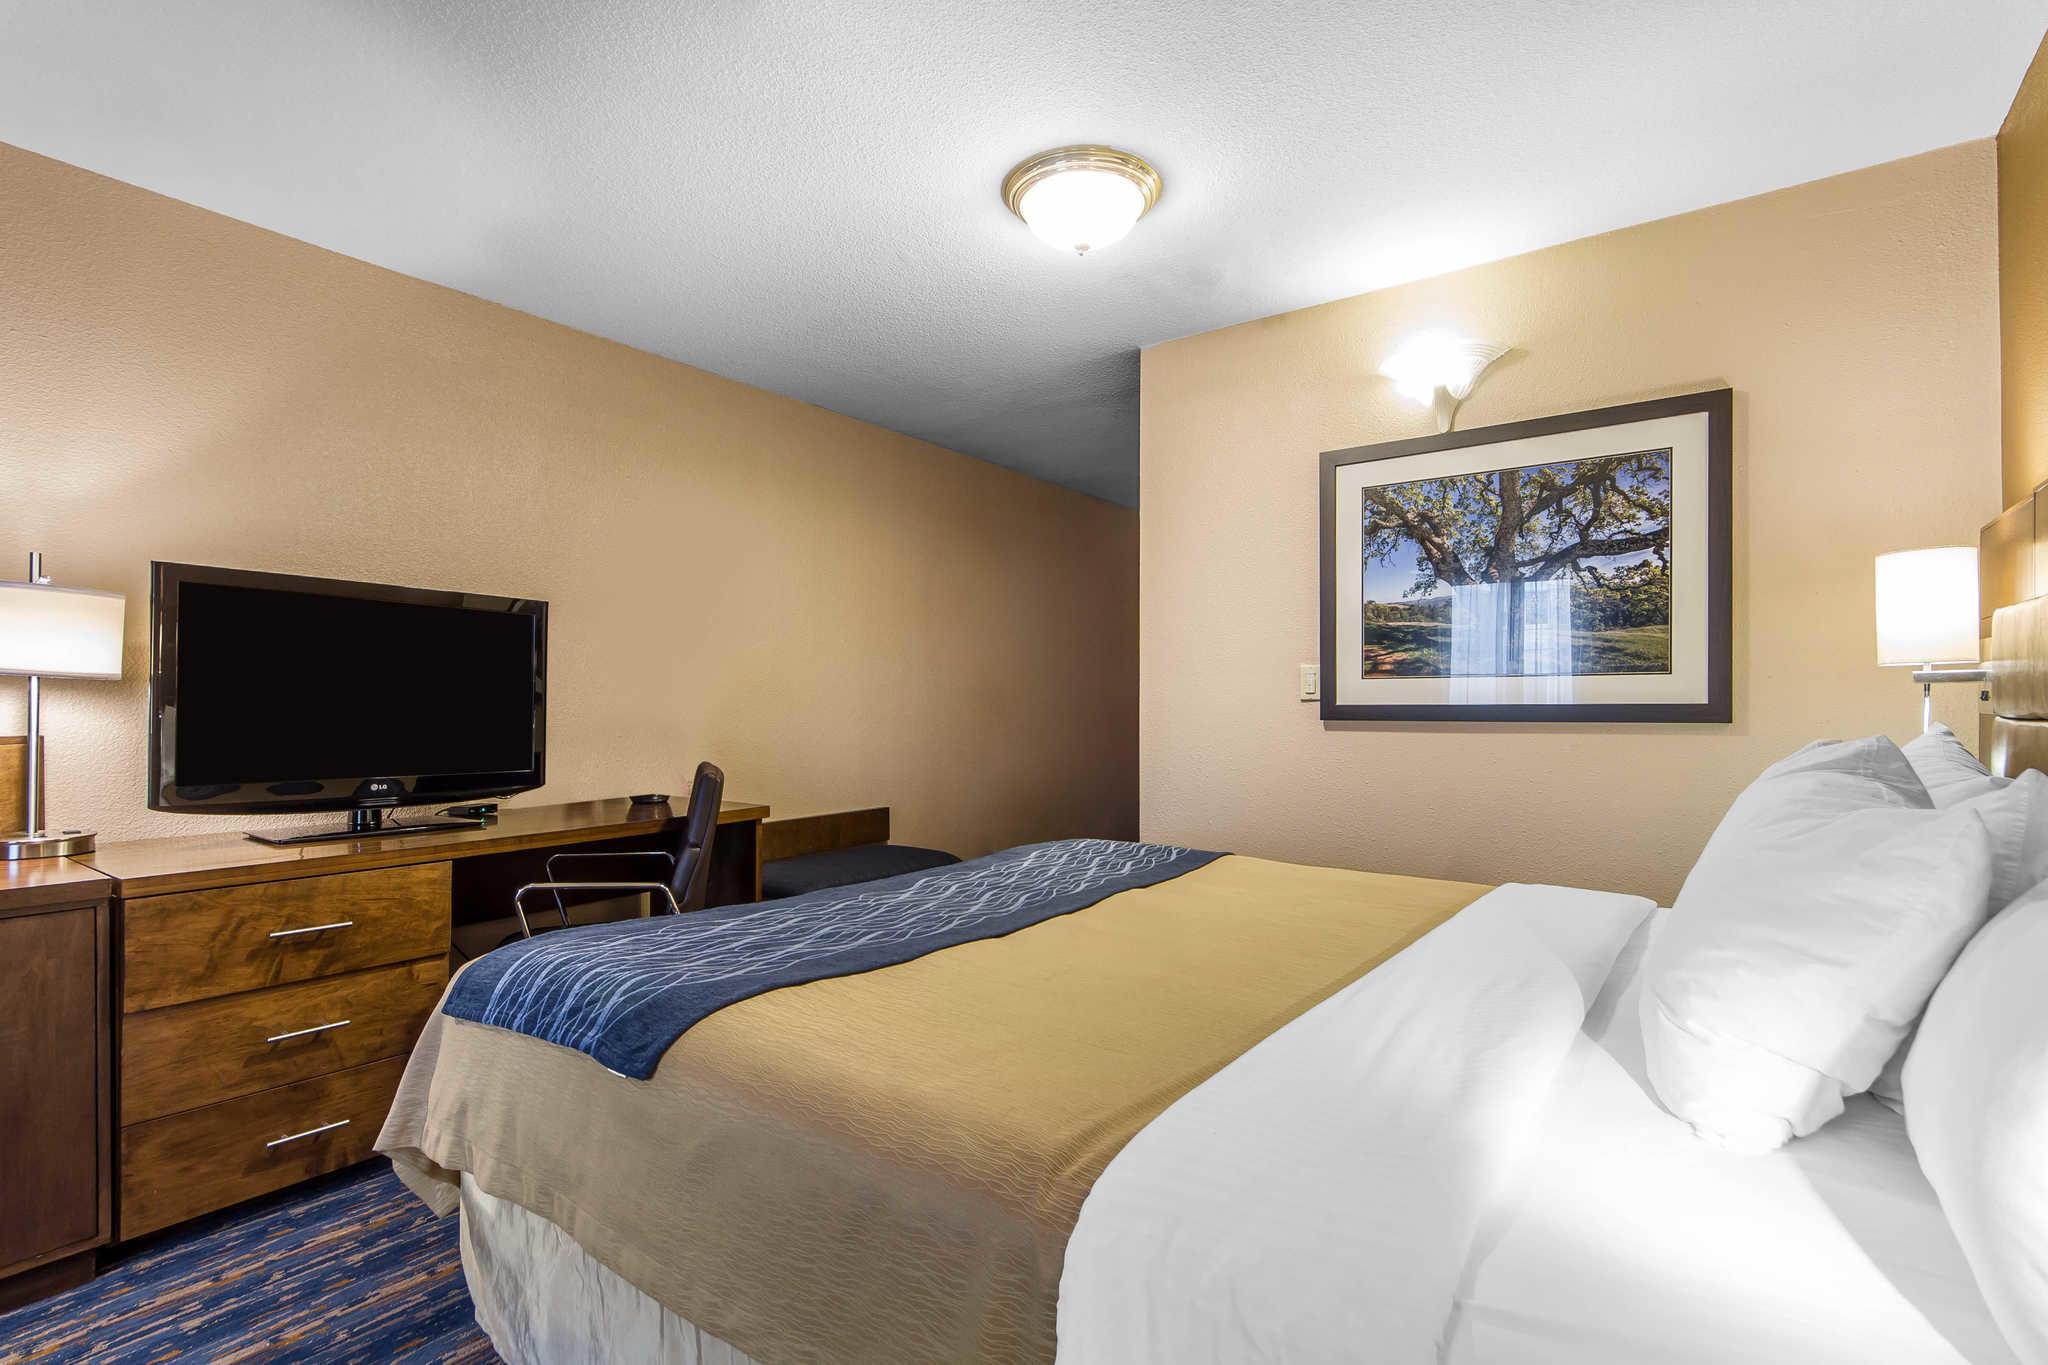 Hotel Rooms In Morgan Hill Ca